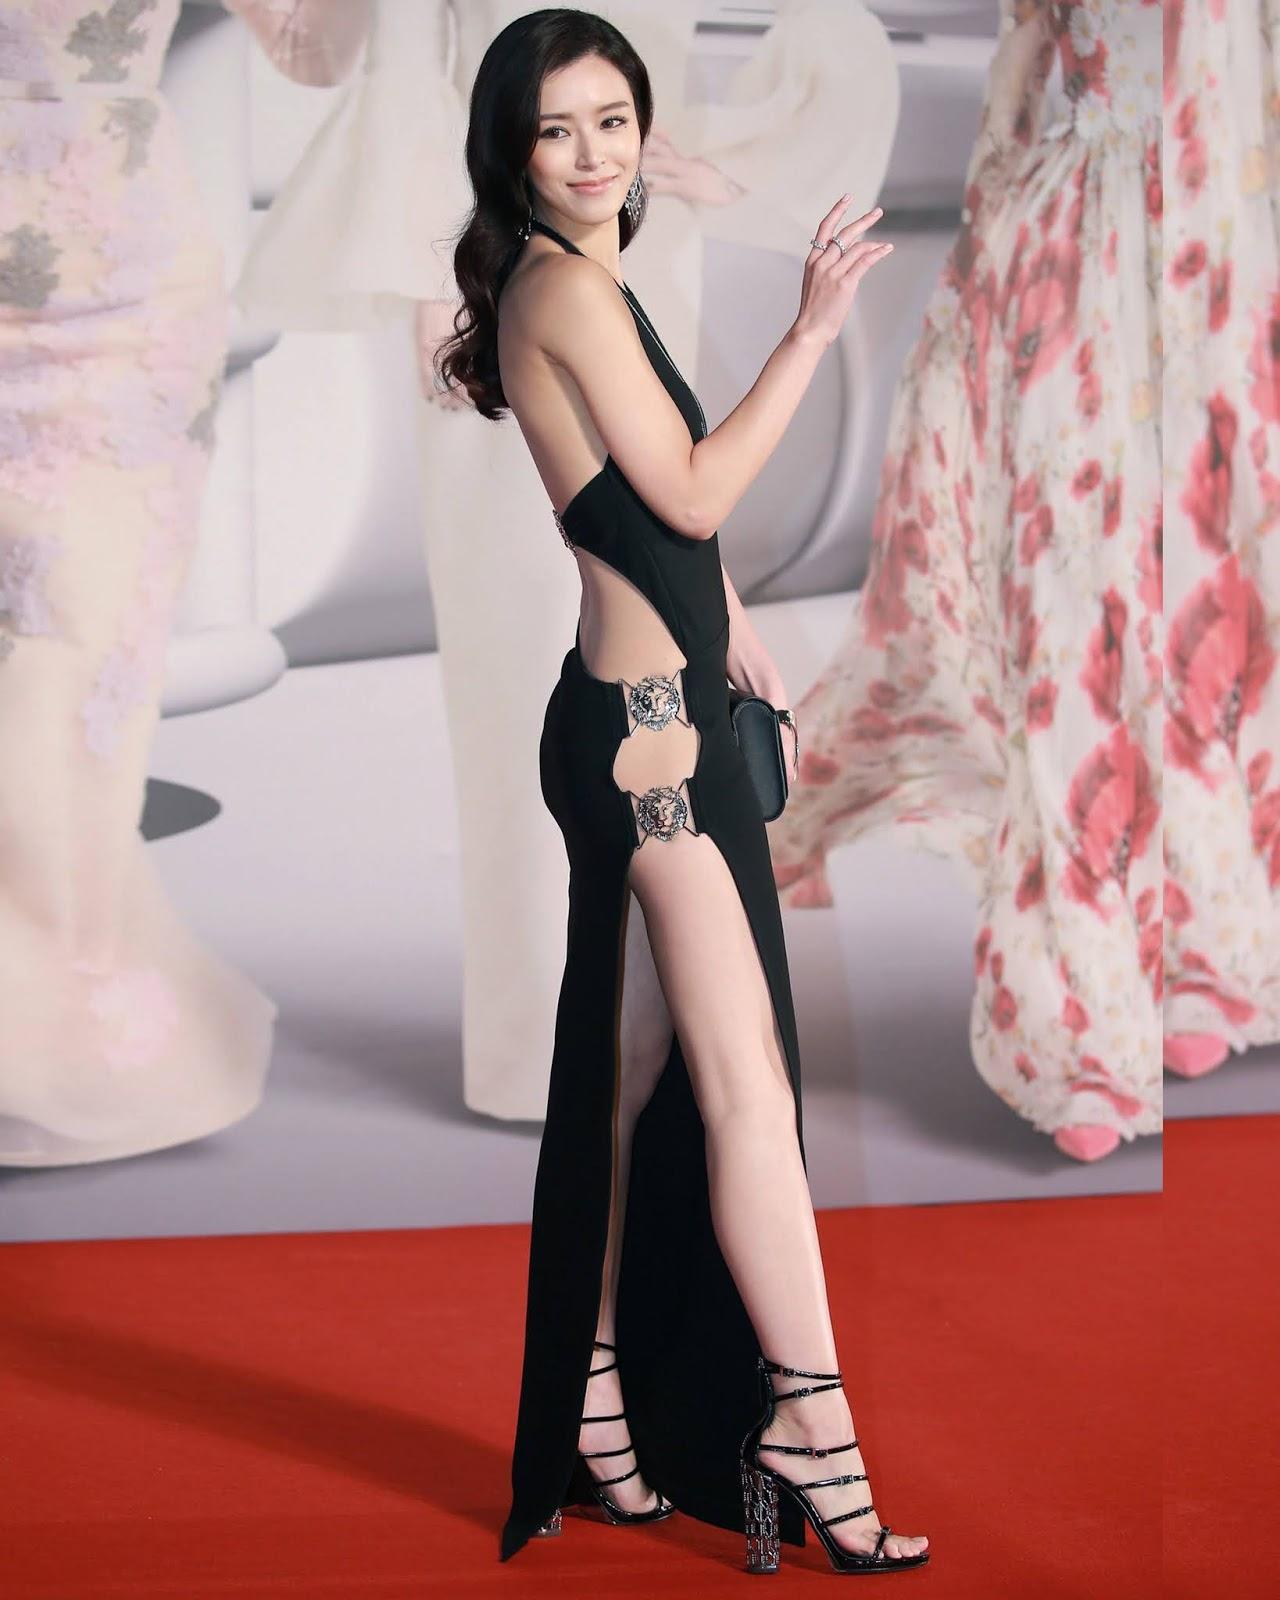 Janice Man artis hongkong dalam balutan Black Dress seksi pamer paha mulus dan kaki jenjang